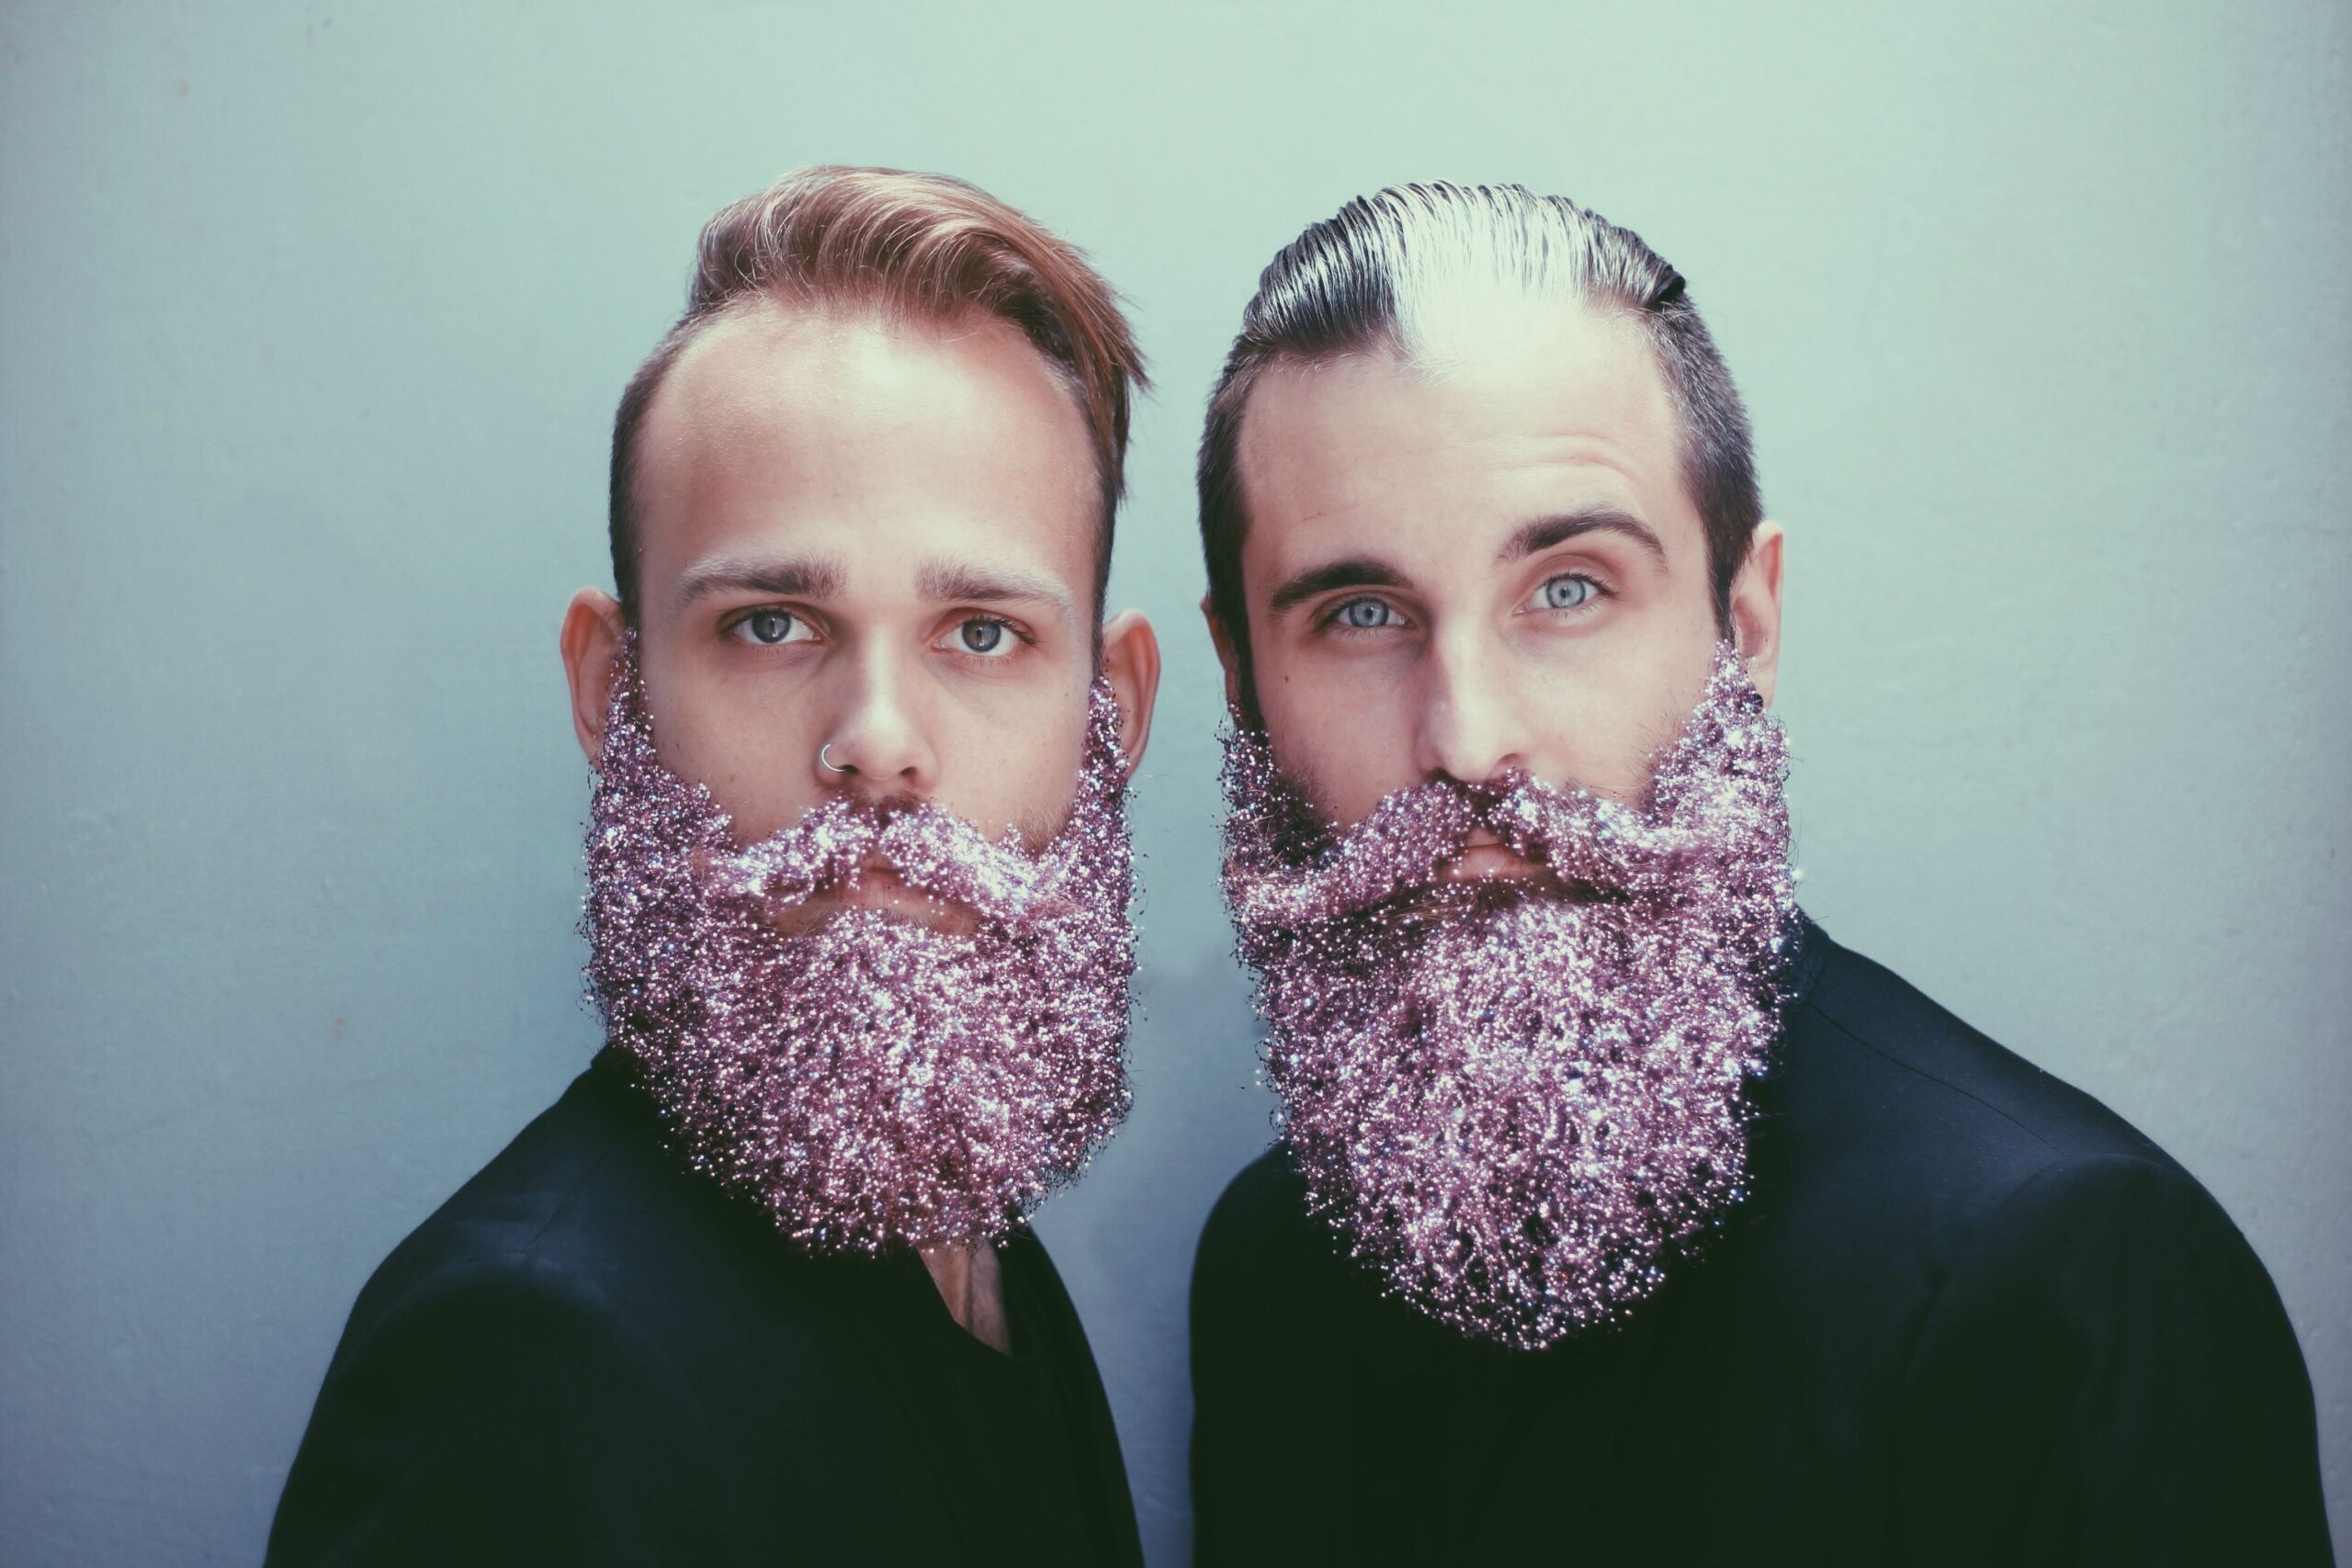 Glitter beard La nuova moda hipster